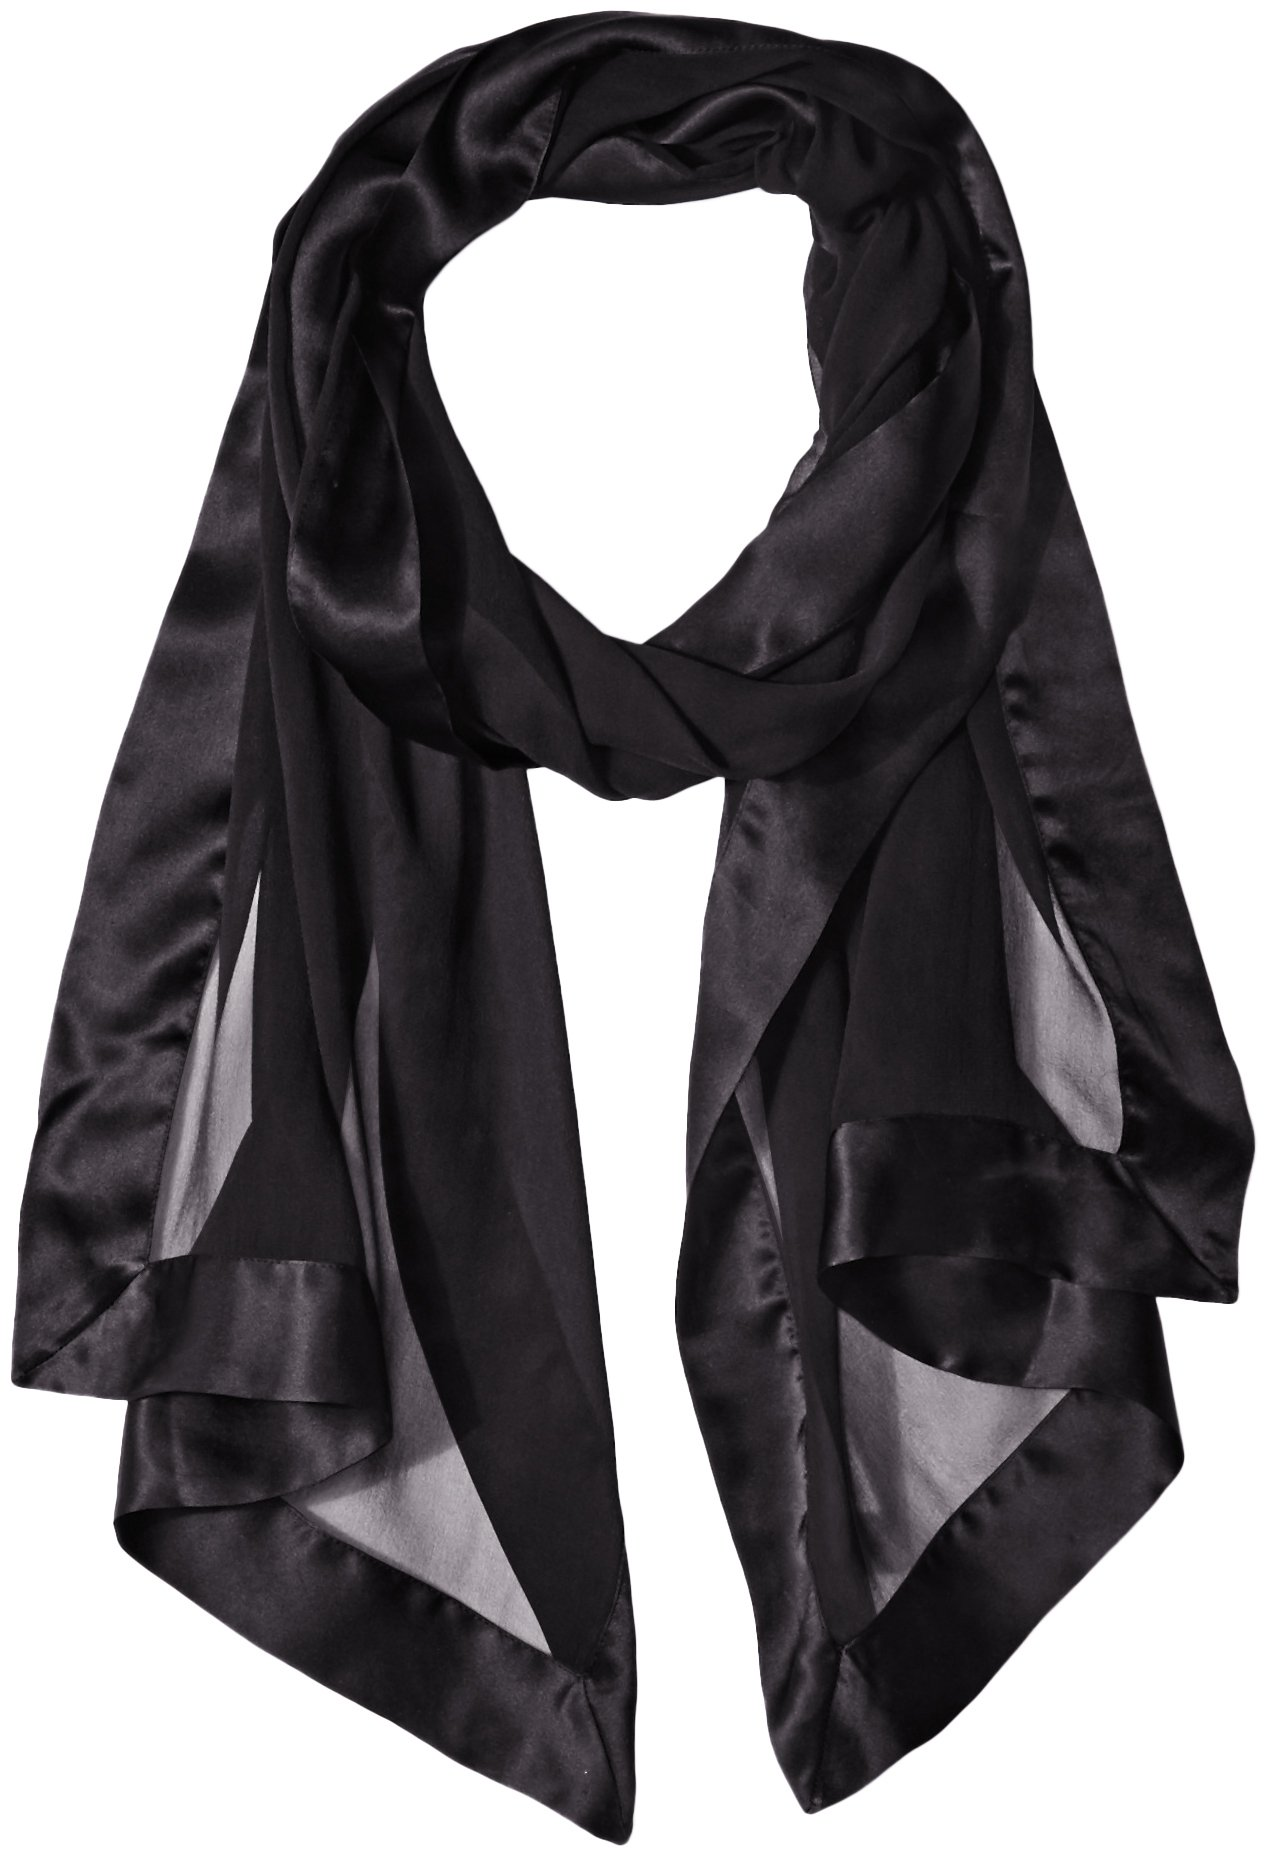 Echo Women's Silk Chiffon Evening Wrap with Satin Border, Black, One Size